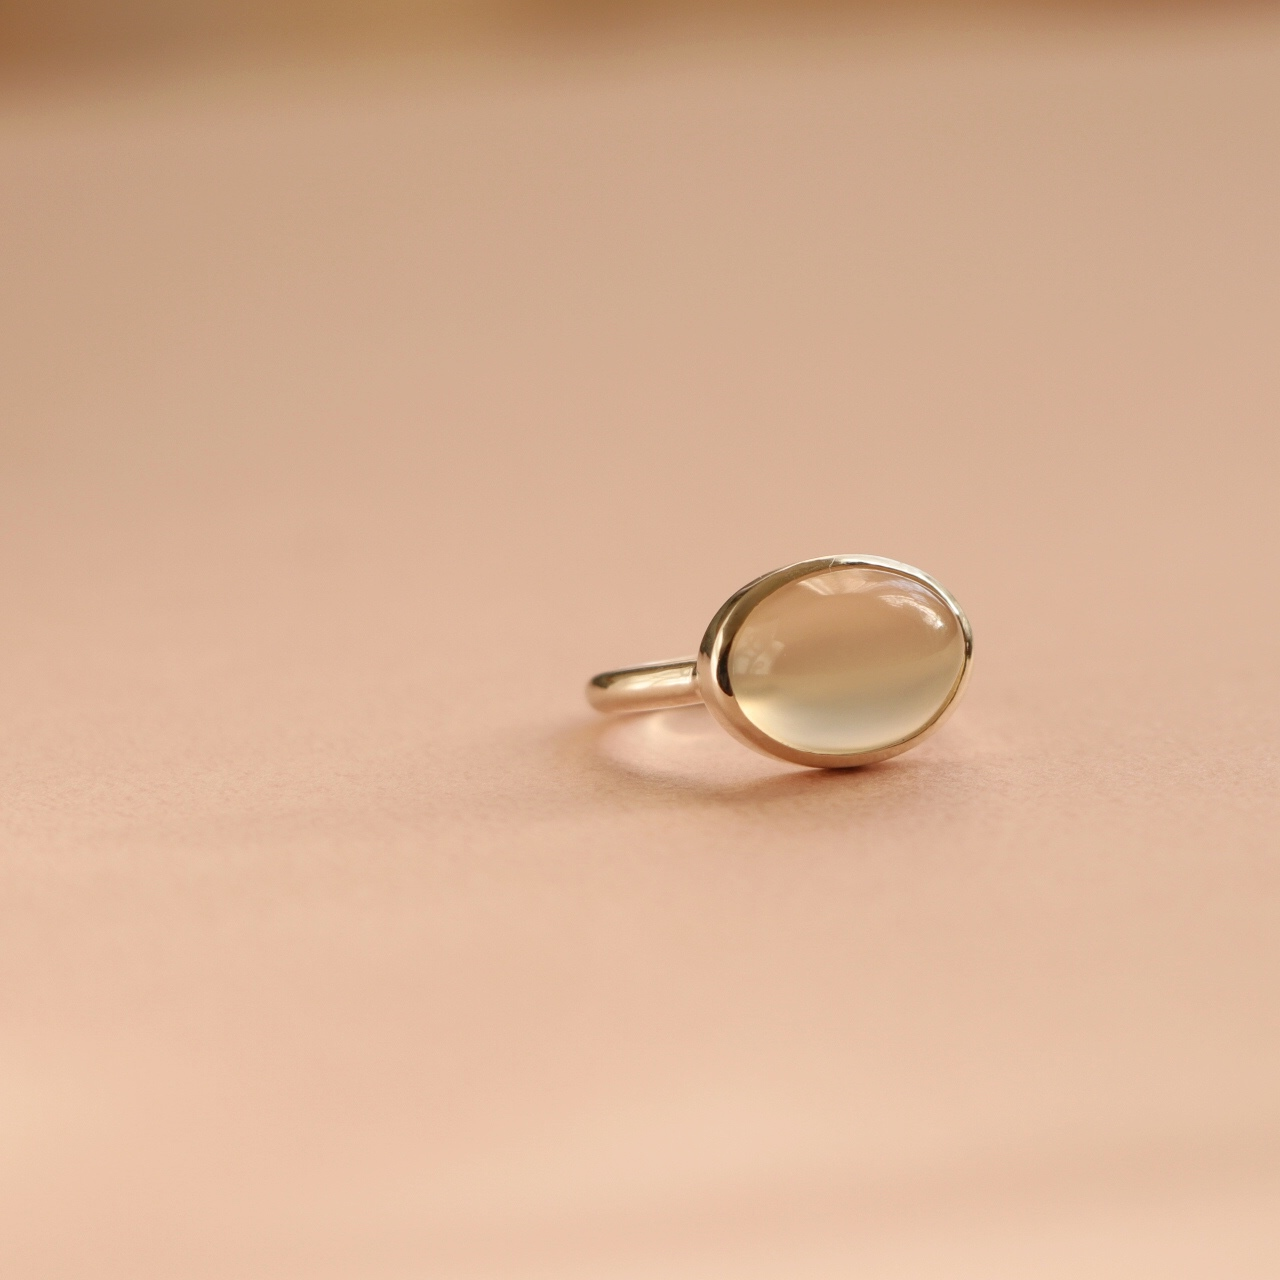 White Moonstone Ring ✧silver925 ✧